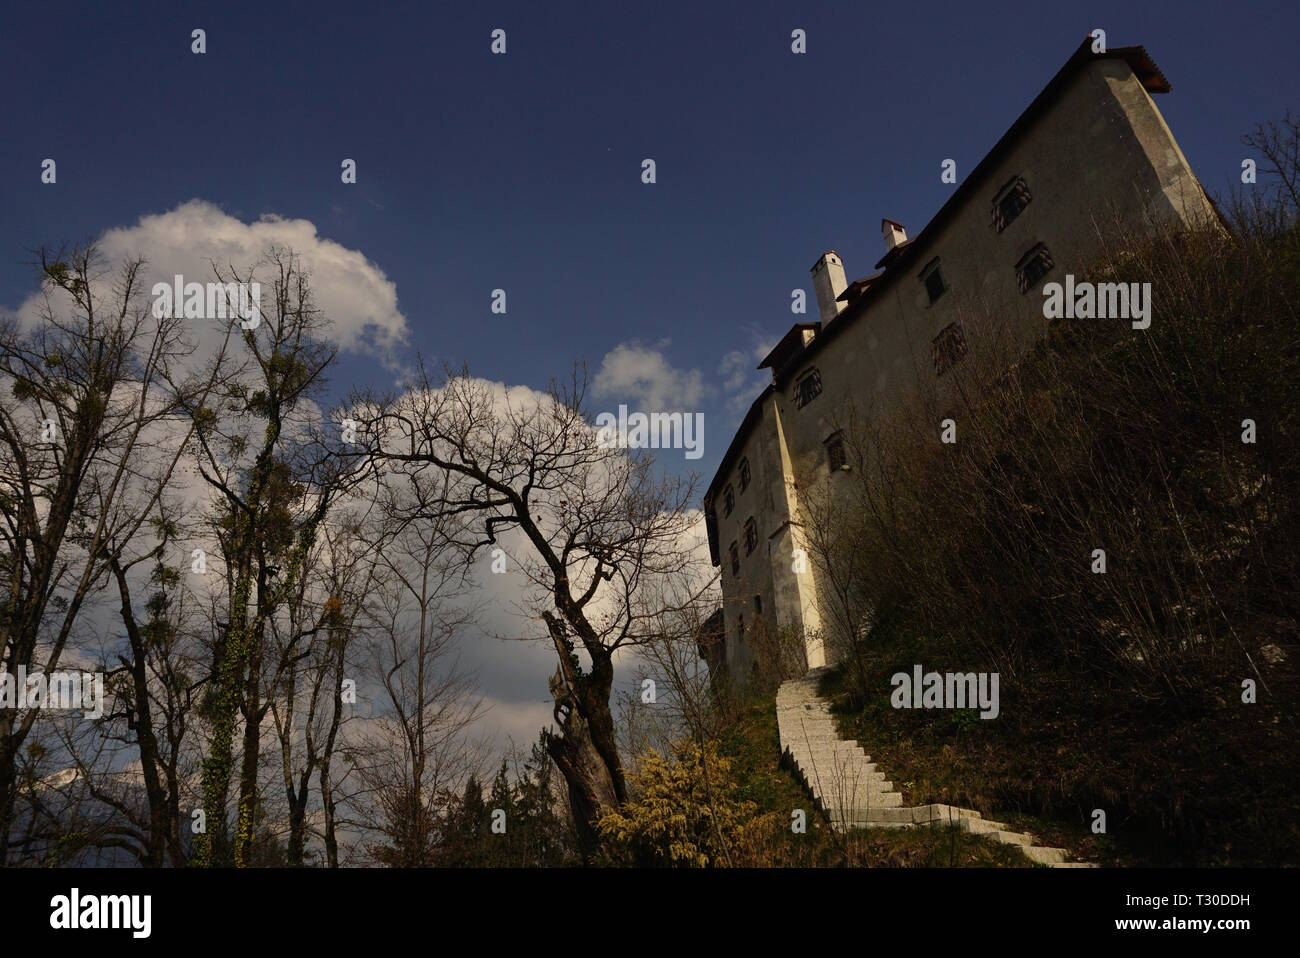 Bled Castle, Slovenia - Stock Image